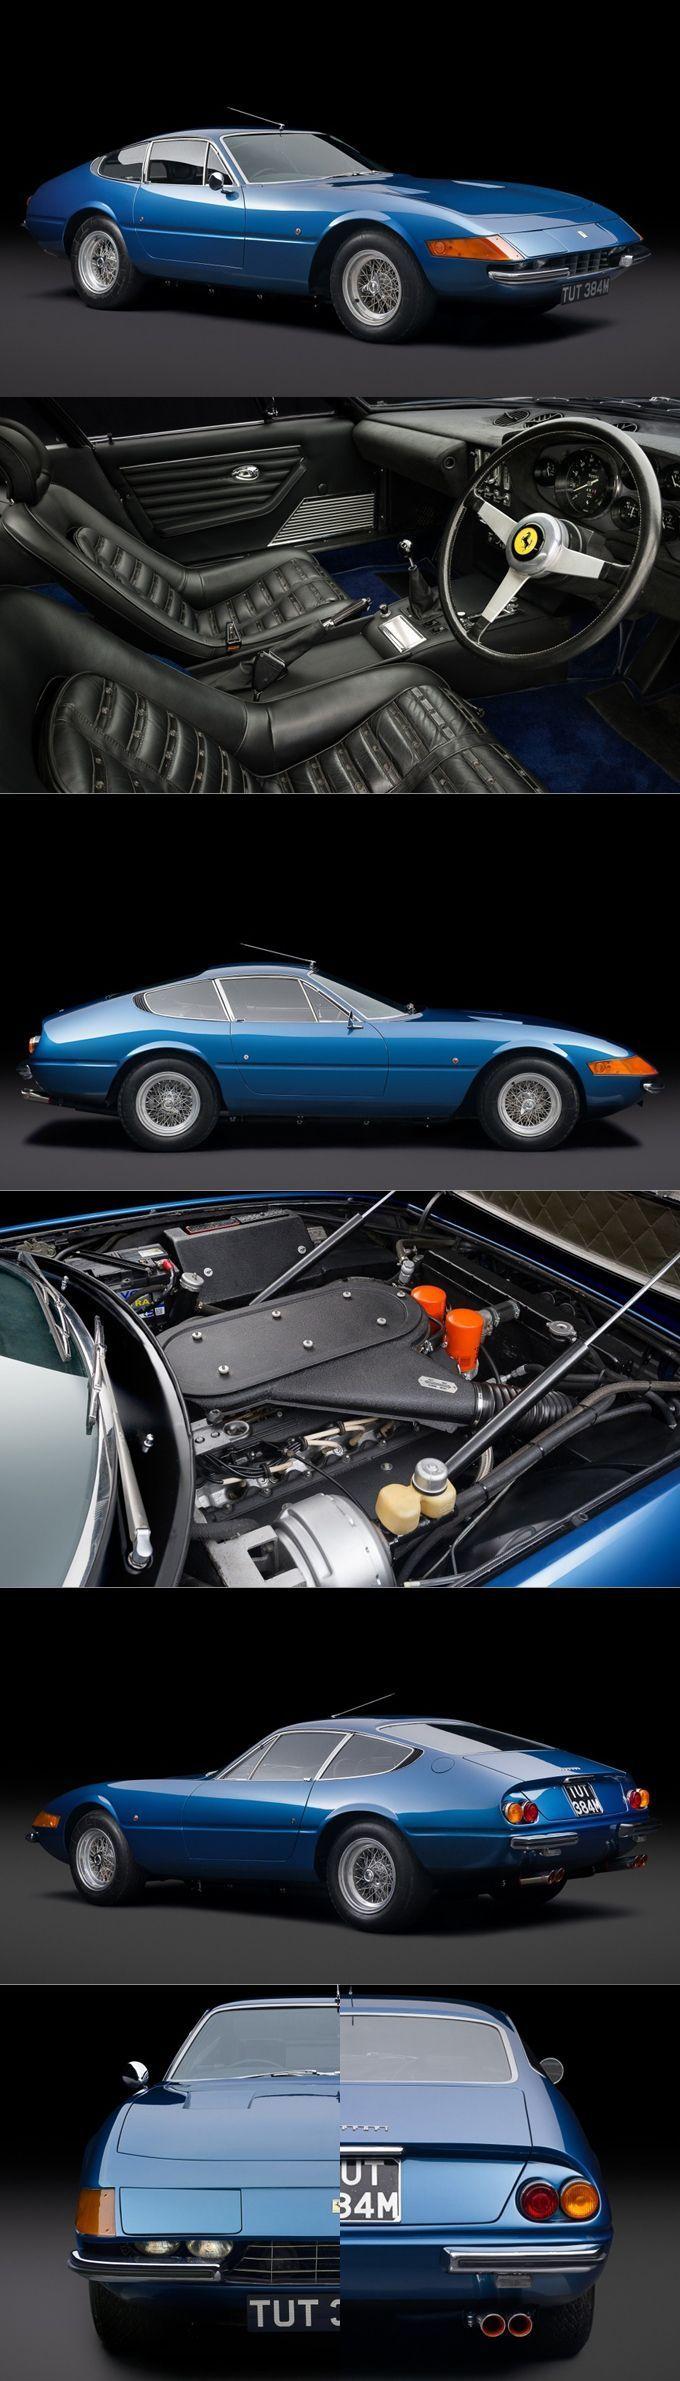 1973 Ferrari 365 GTB/4 Daytona / 352hp V12 / Italy / blue #ferrarienzo